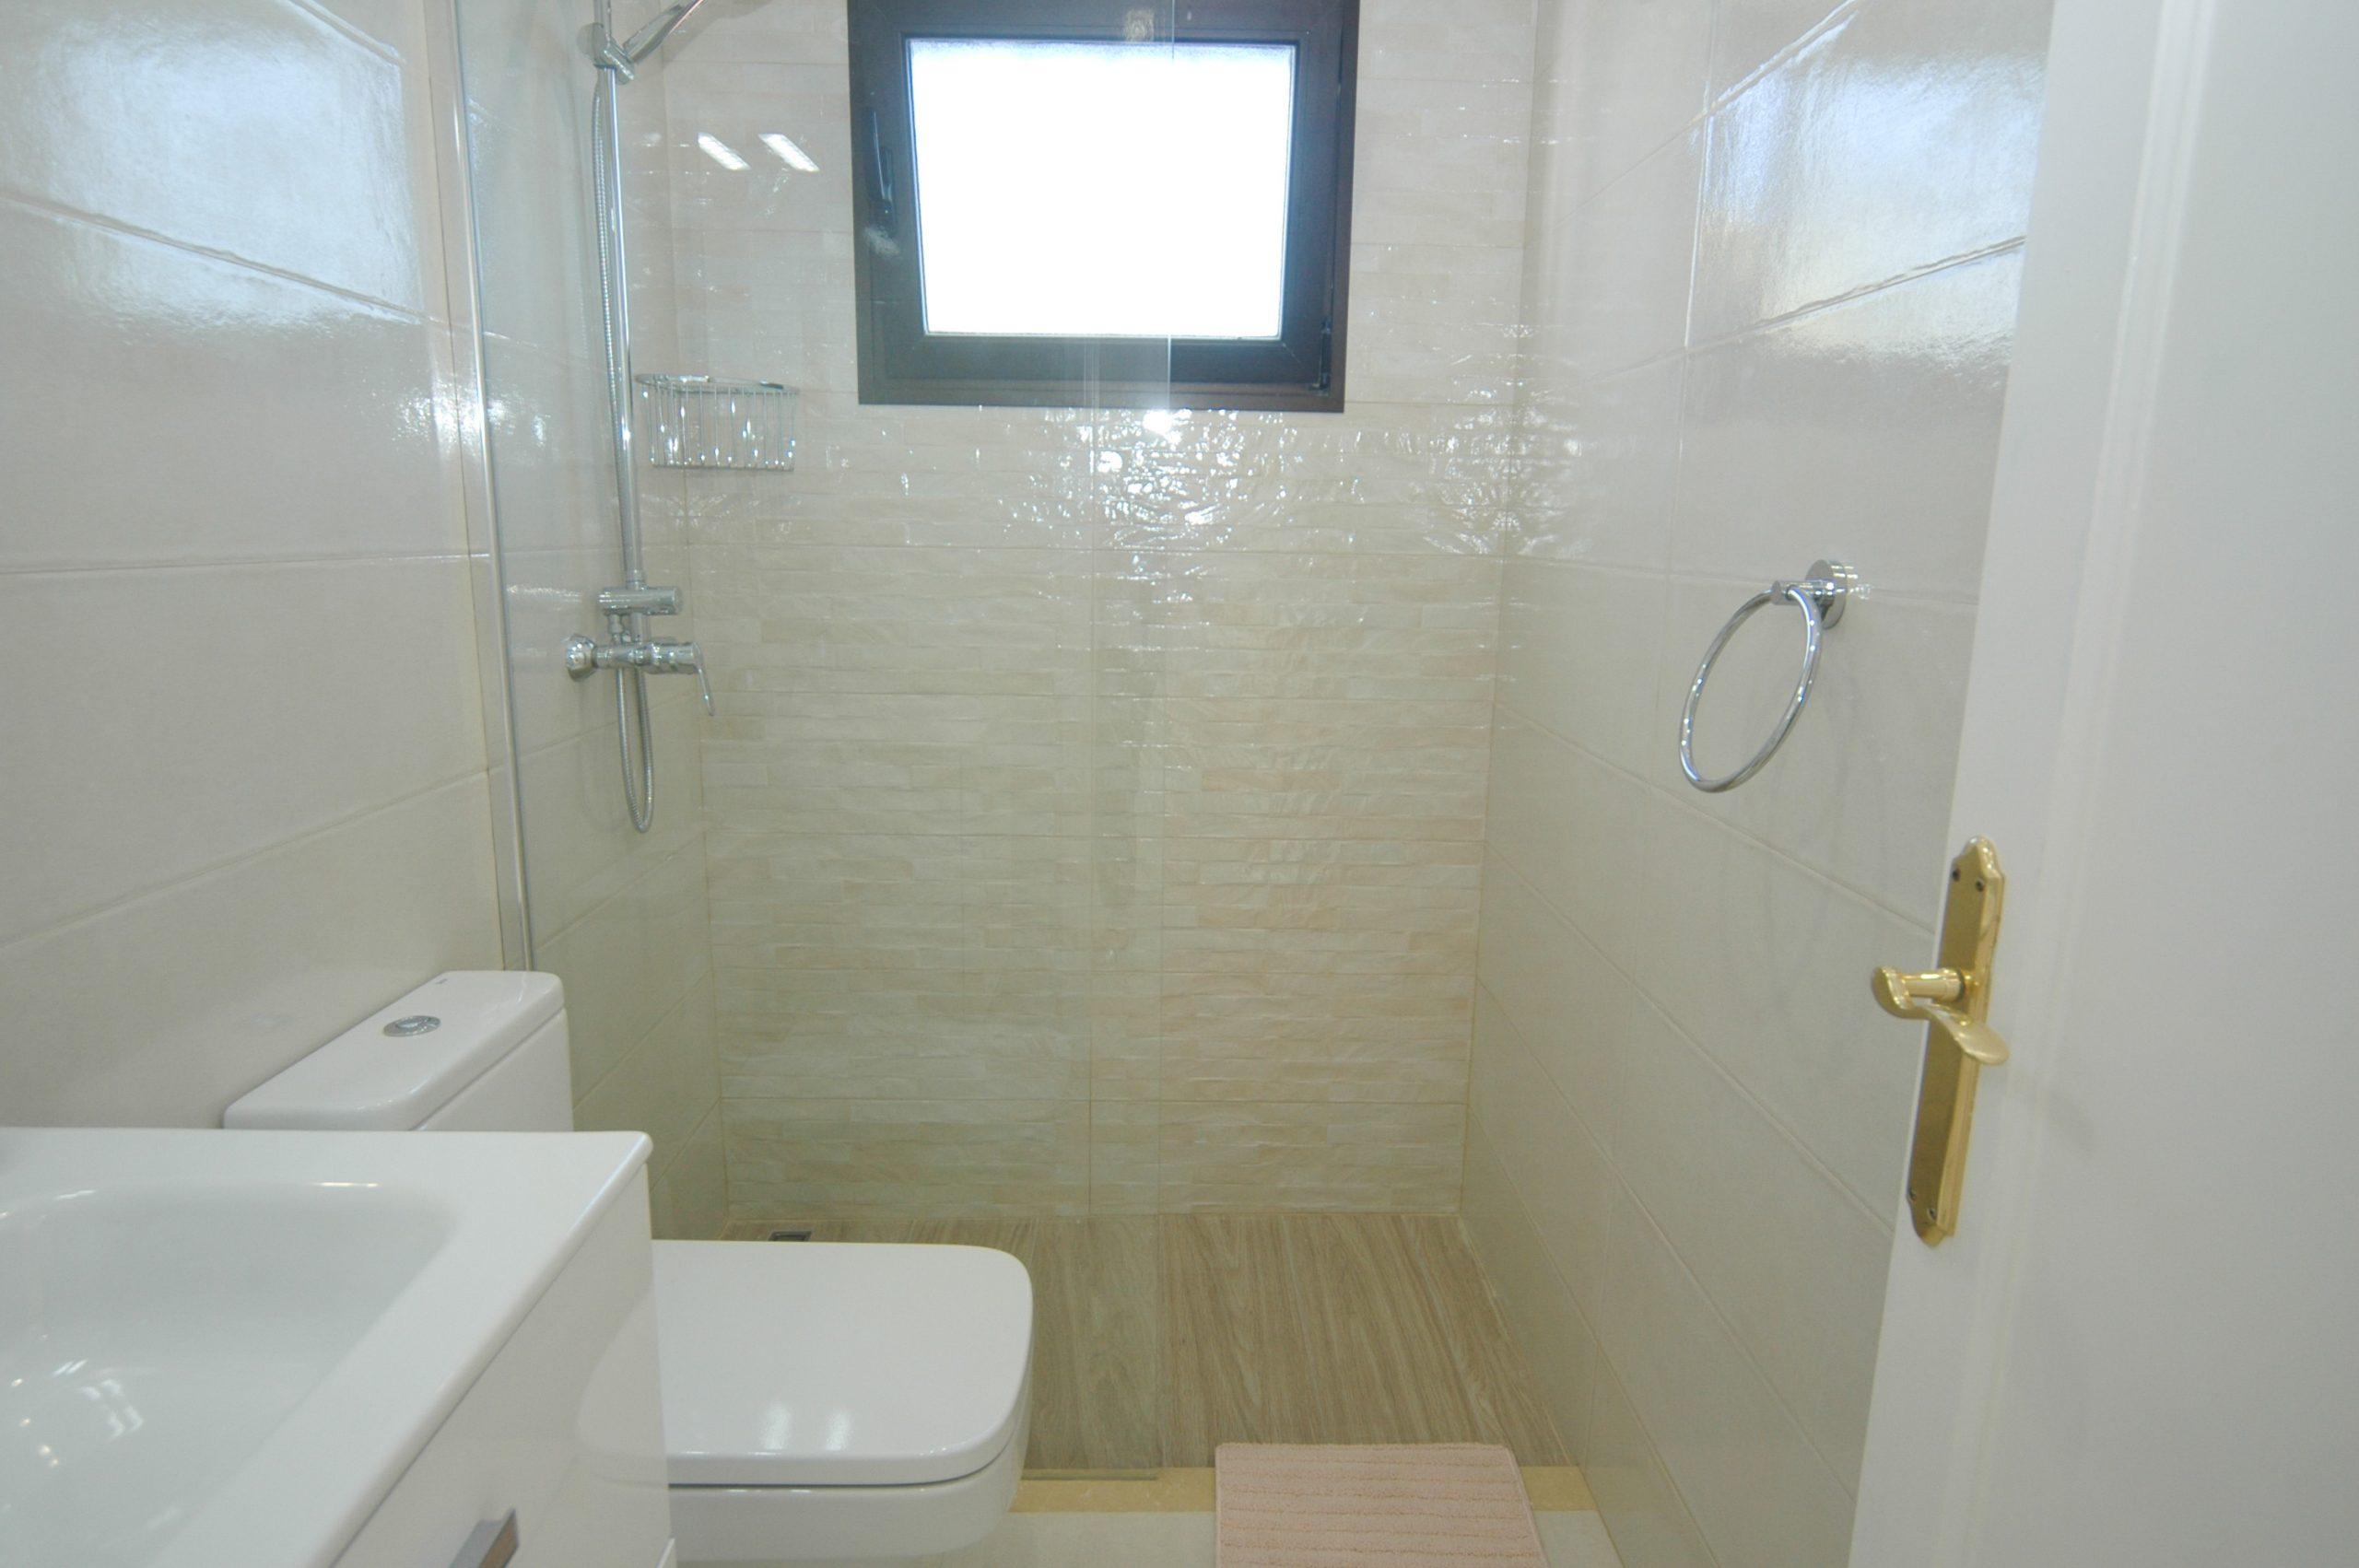 LVC281800 Second shower room